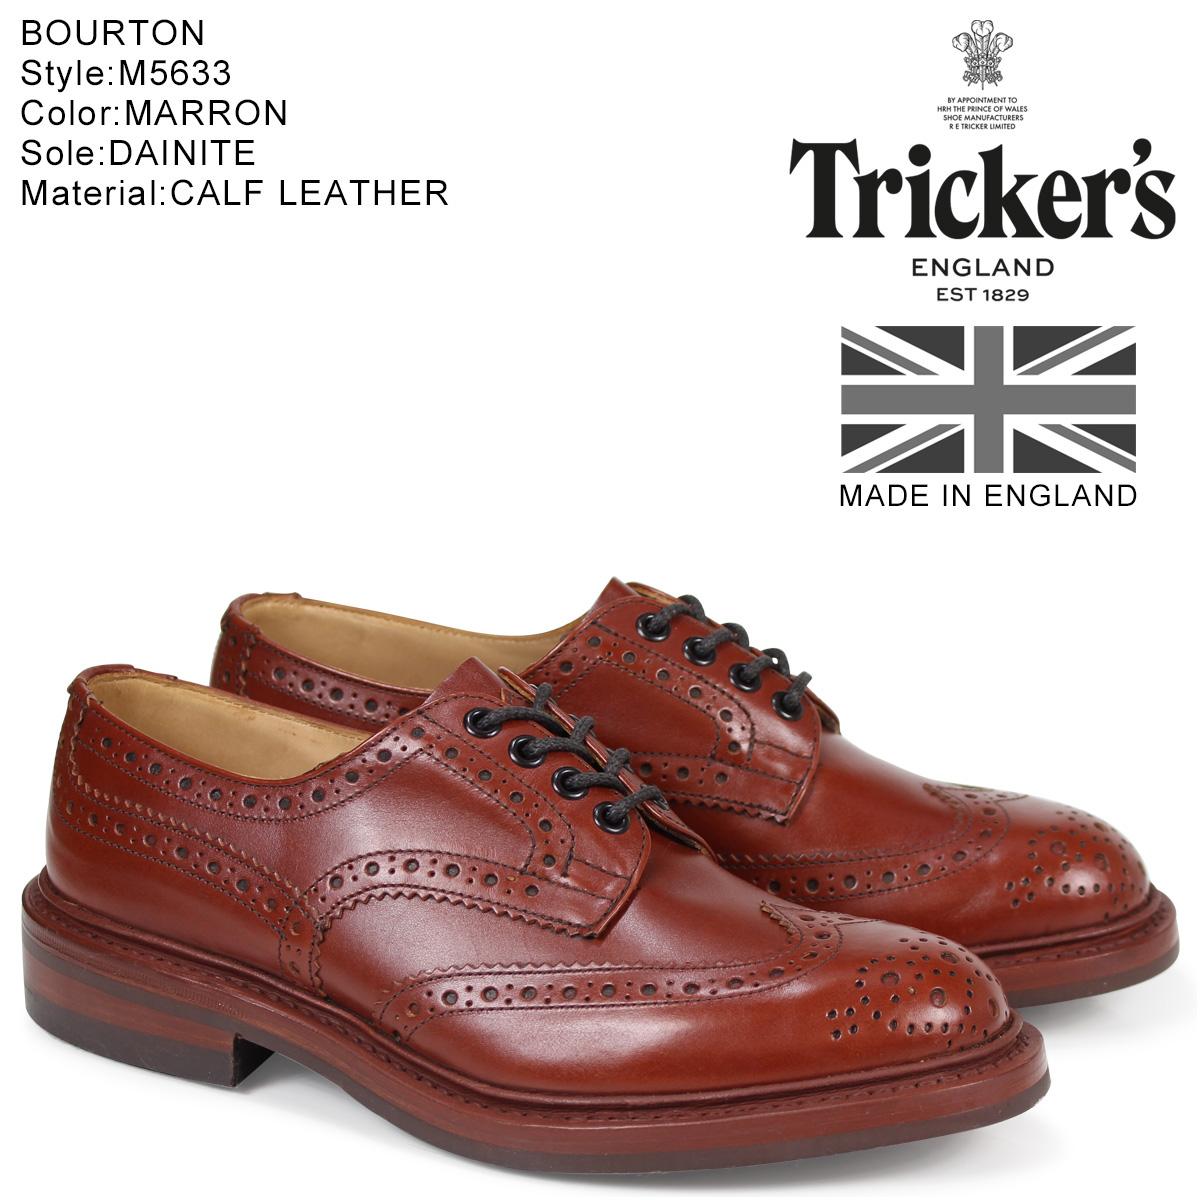 SneaK Online Shop | Rakuten Global Market: Trickers Tricker's Burton wing tip shoes M5633 BOURTON ダイナイトソール calf leather mens Made In ENGLAND Trickers Boughton